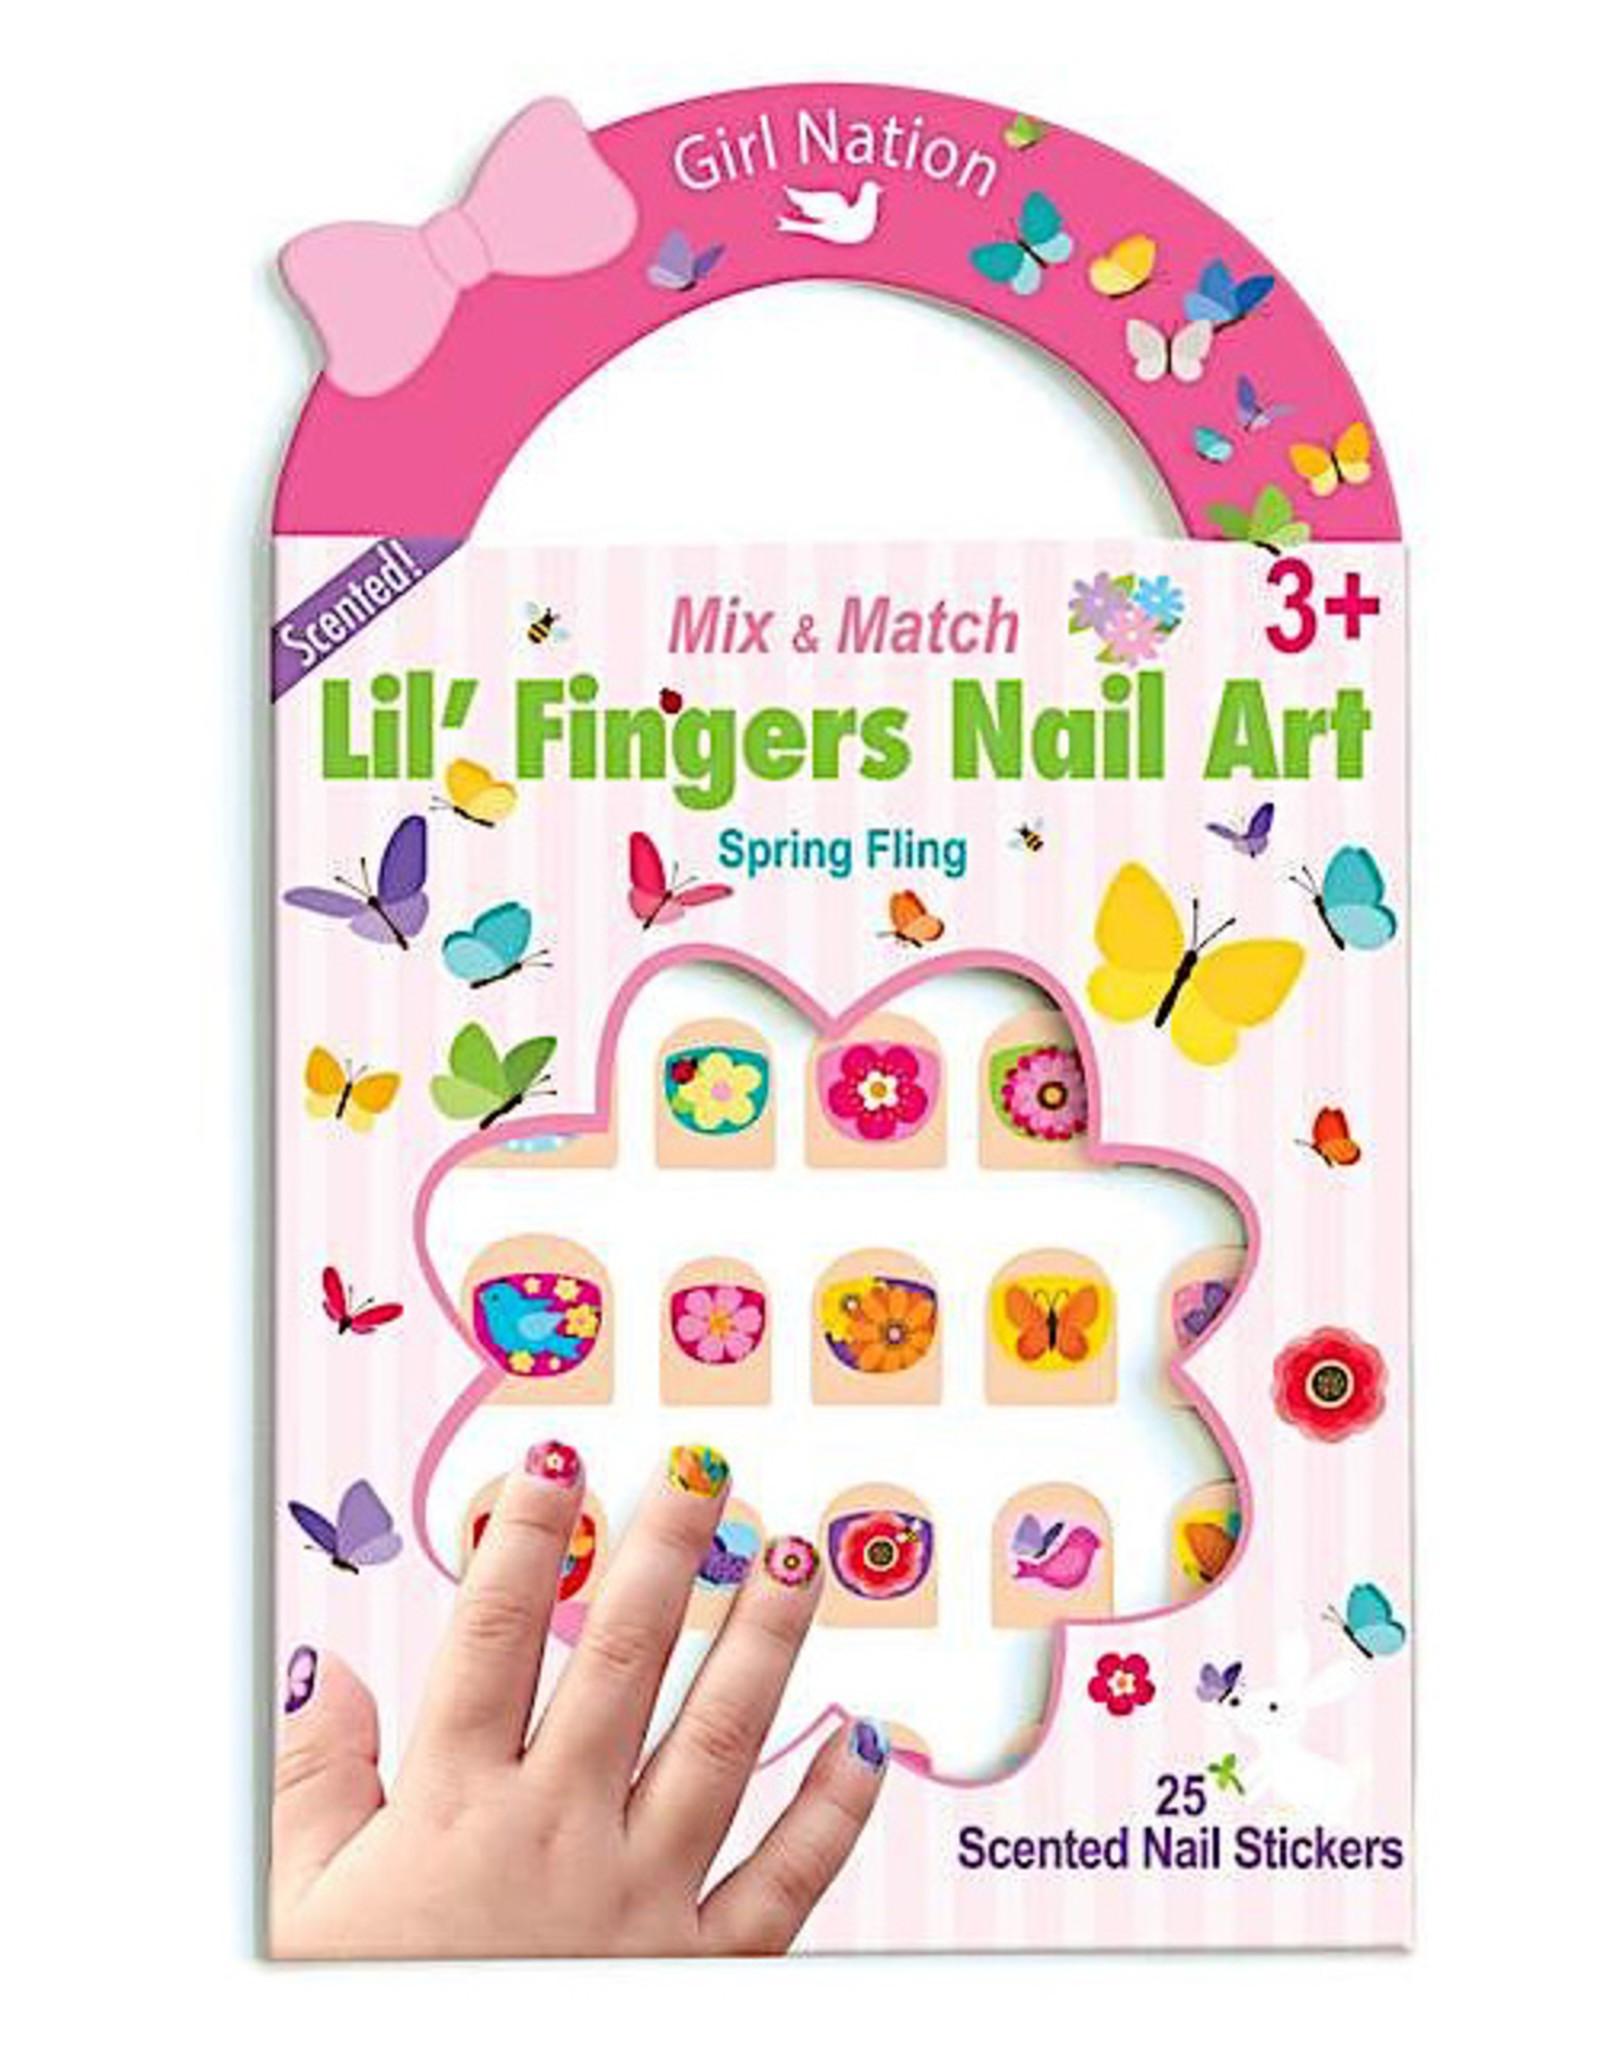 Girl Nation Lil' Fingers Nail Art